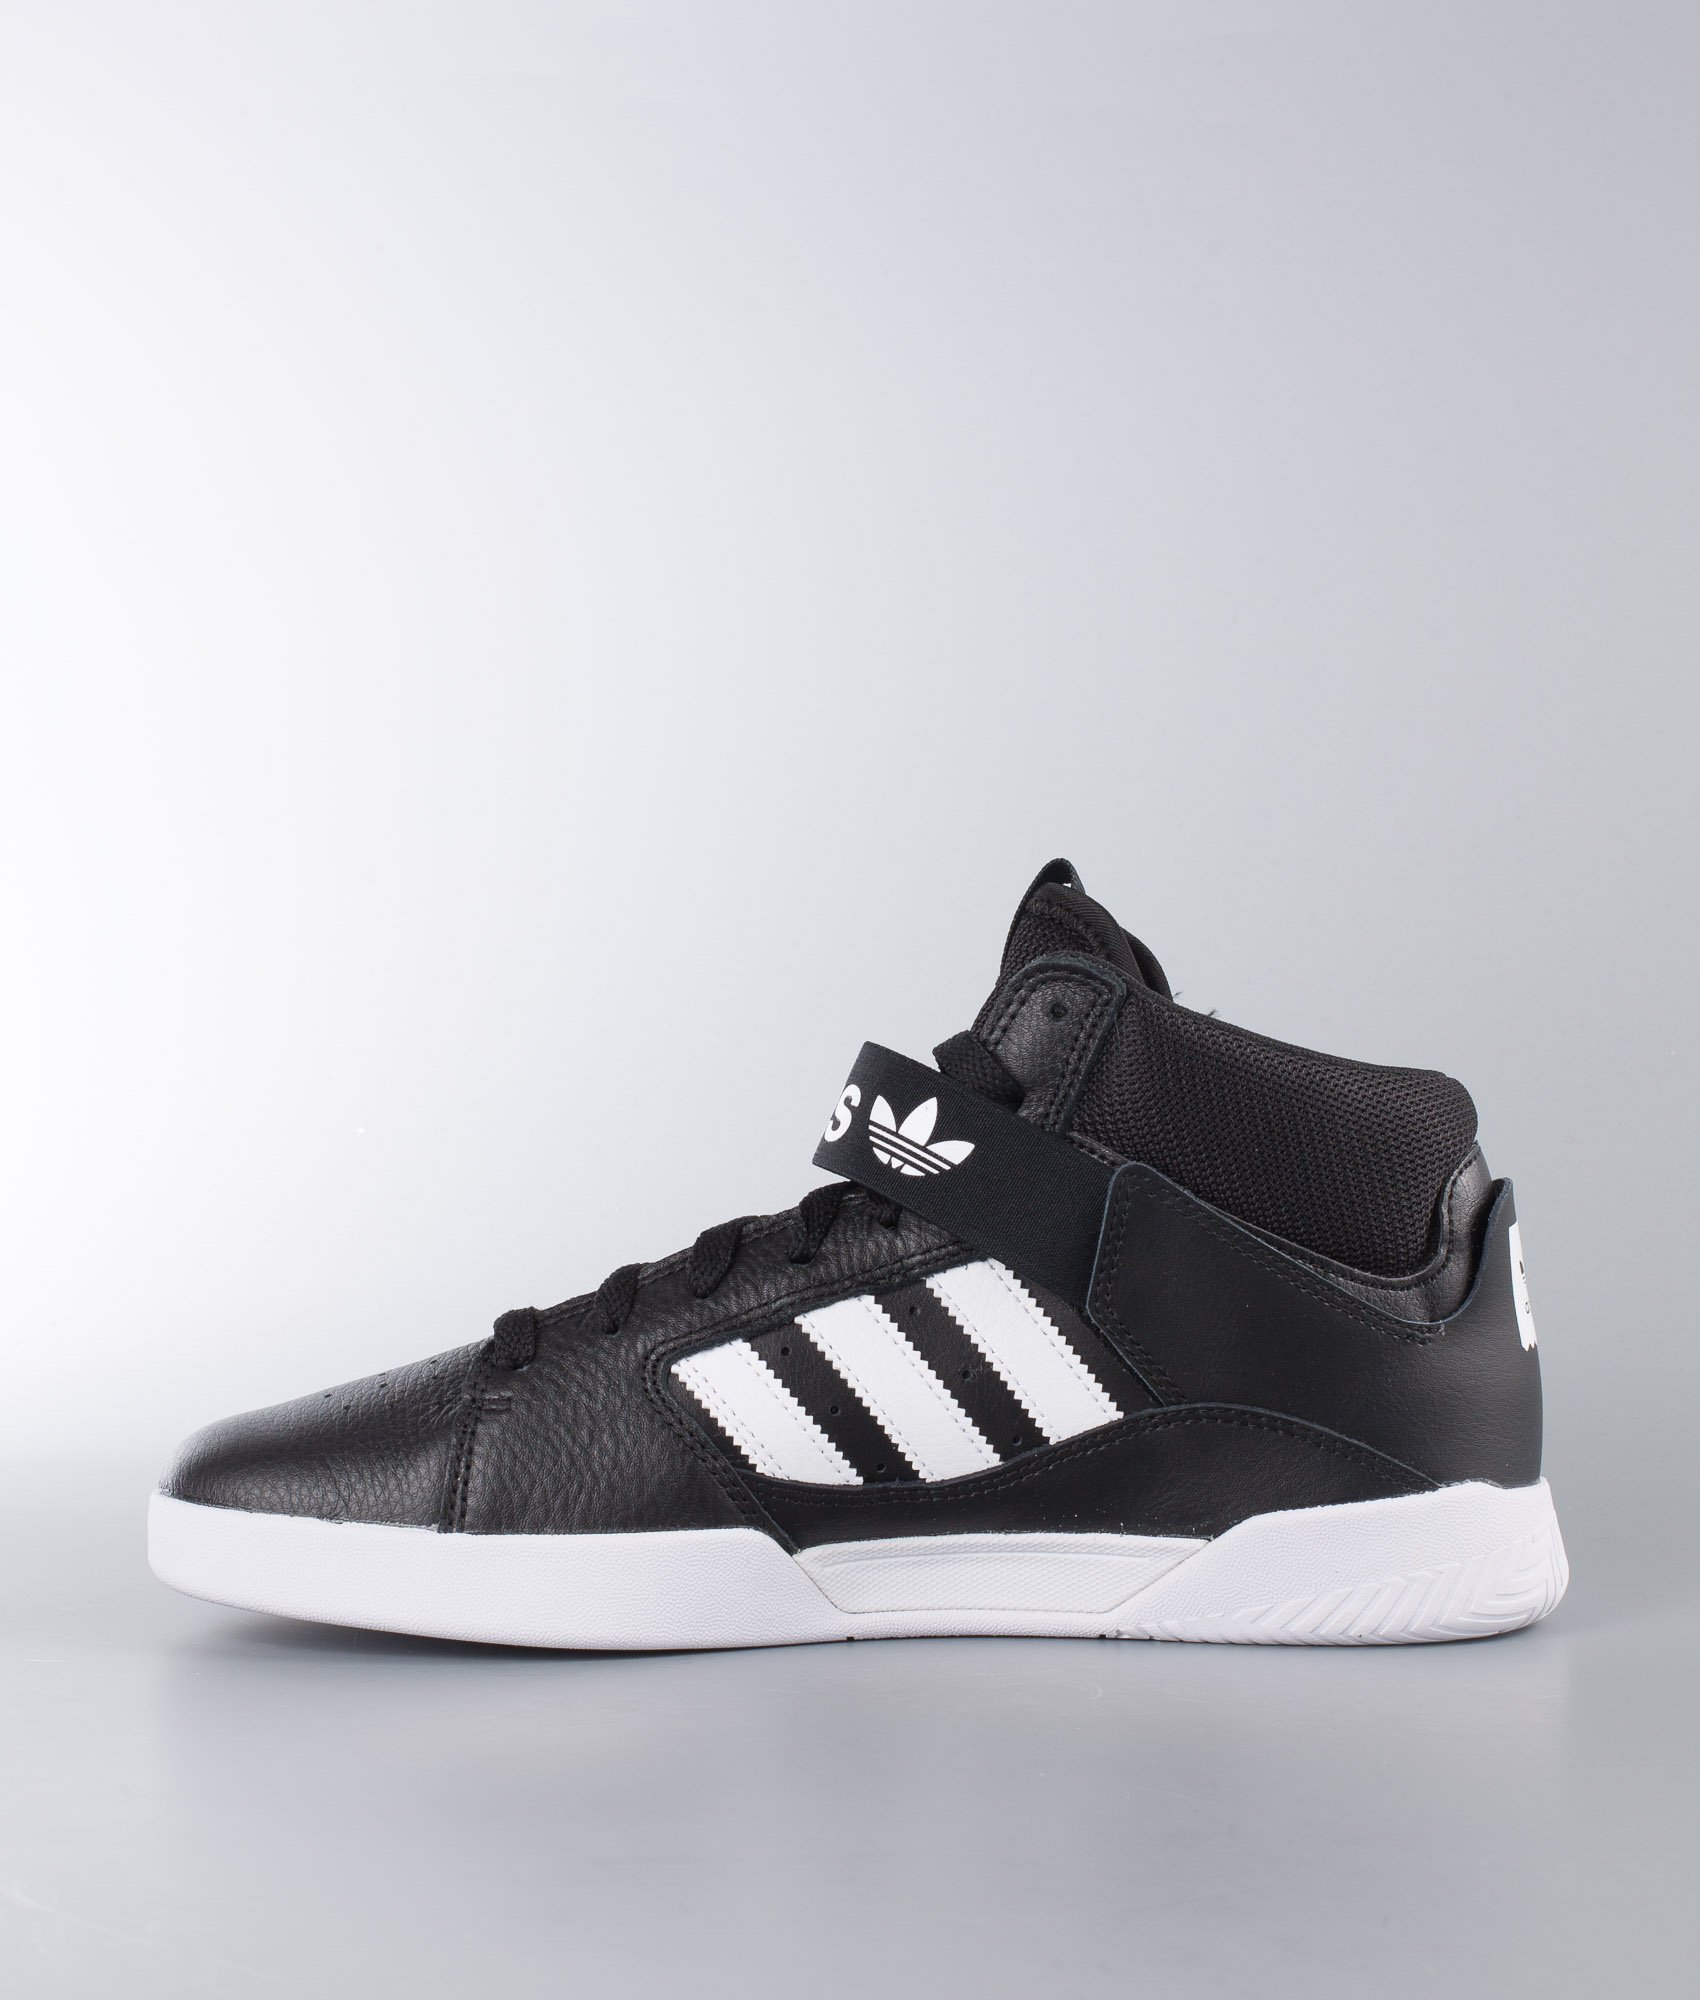 Skateboarding Adidas White Blackftwr Whiteftwr Mid Schoenen Vrx Core Uq40qd